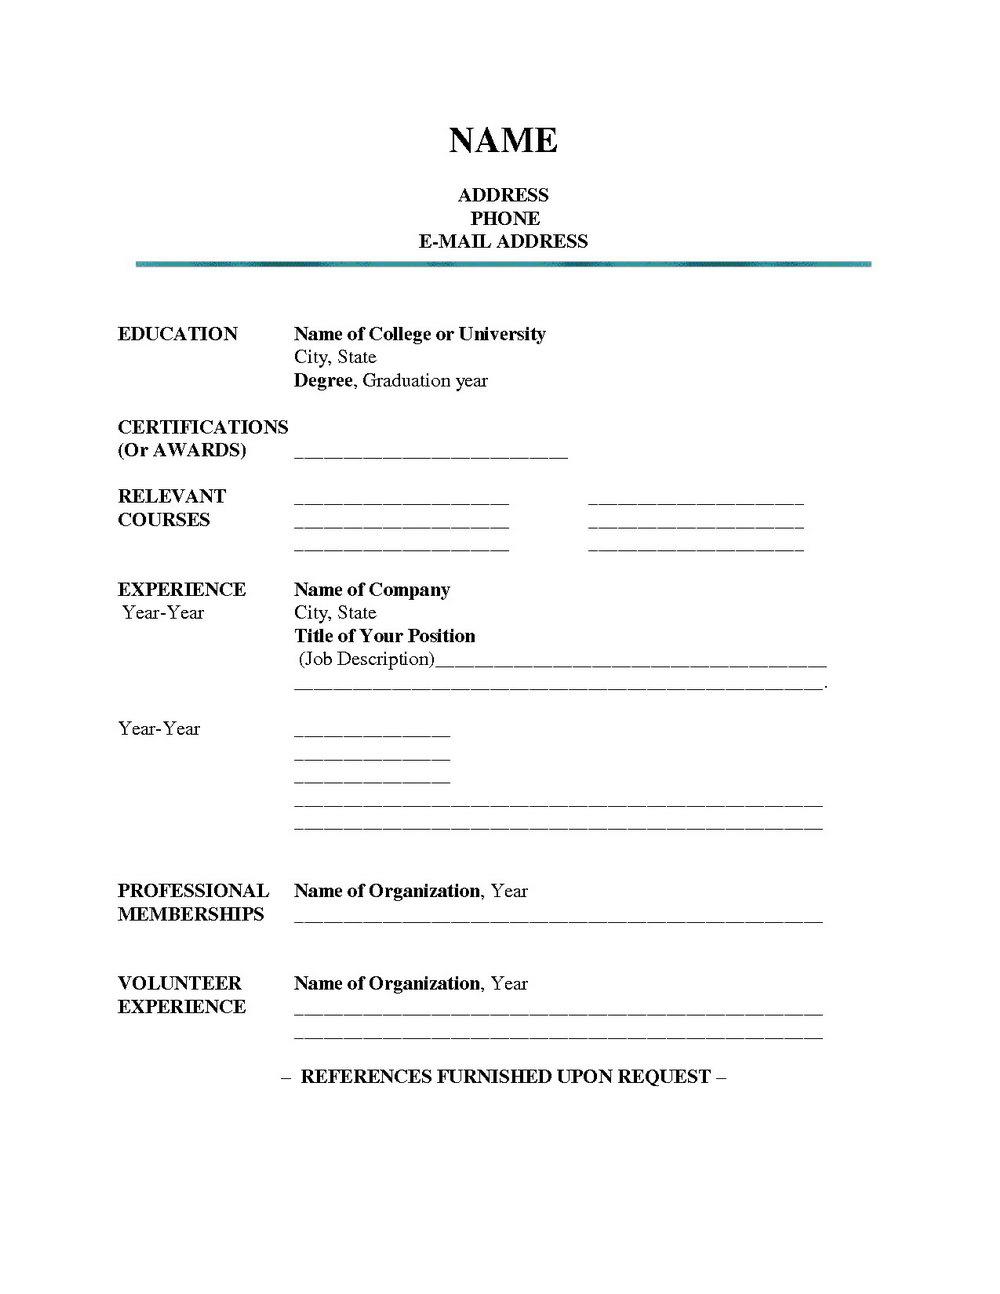 Blank Resume Format For Freshers Pdf